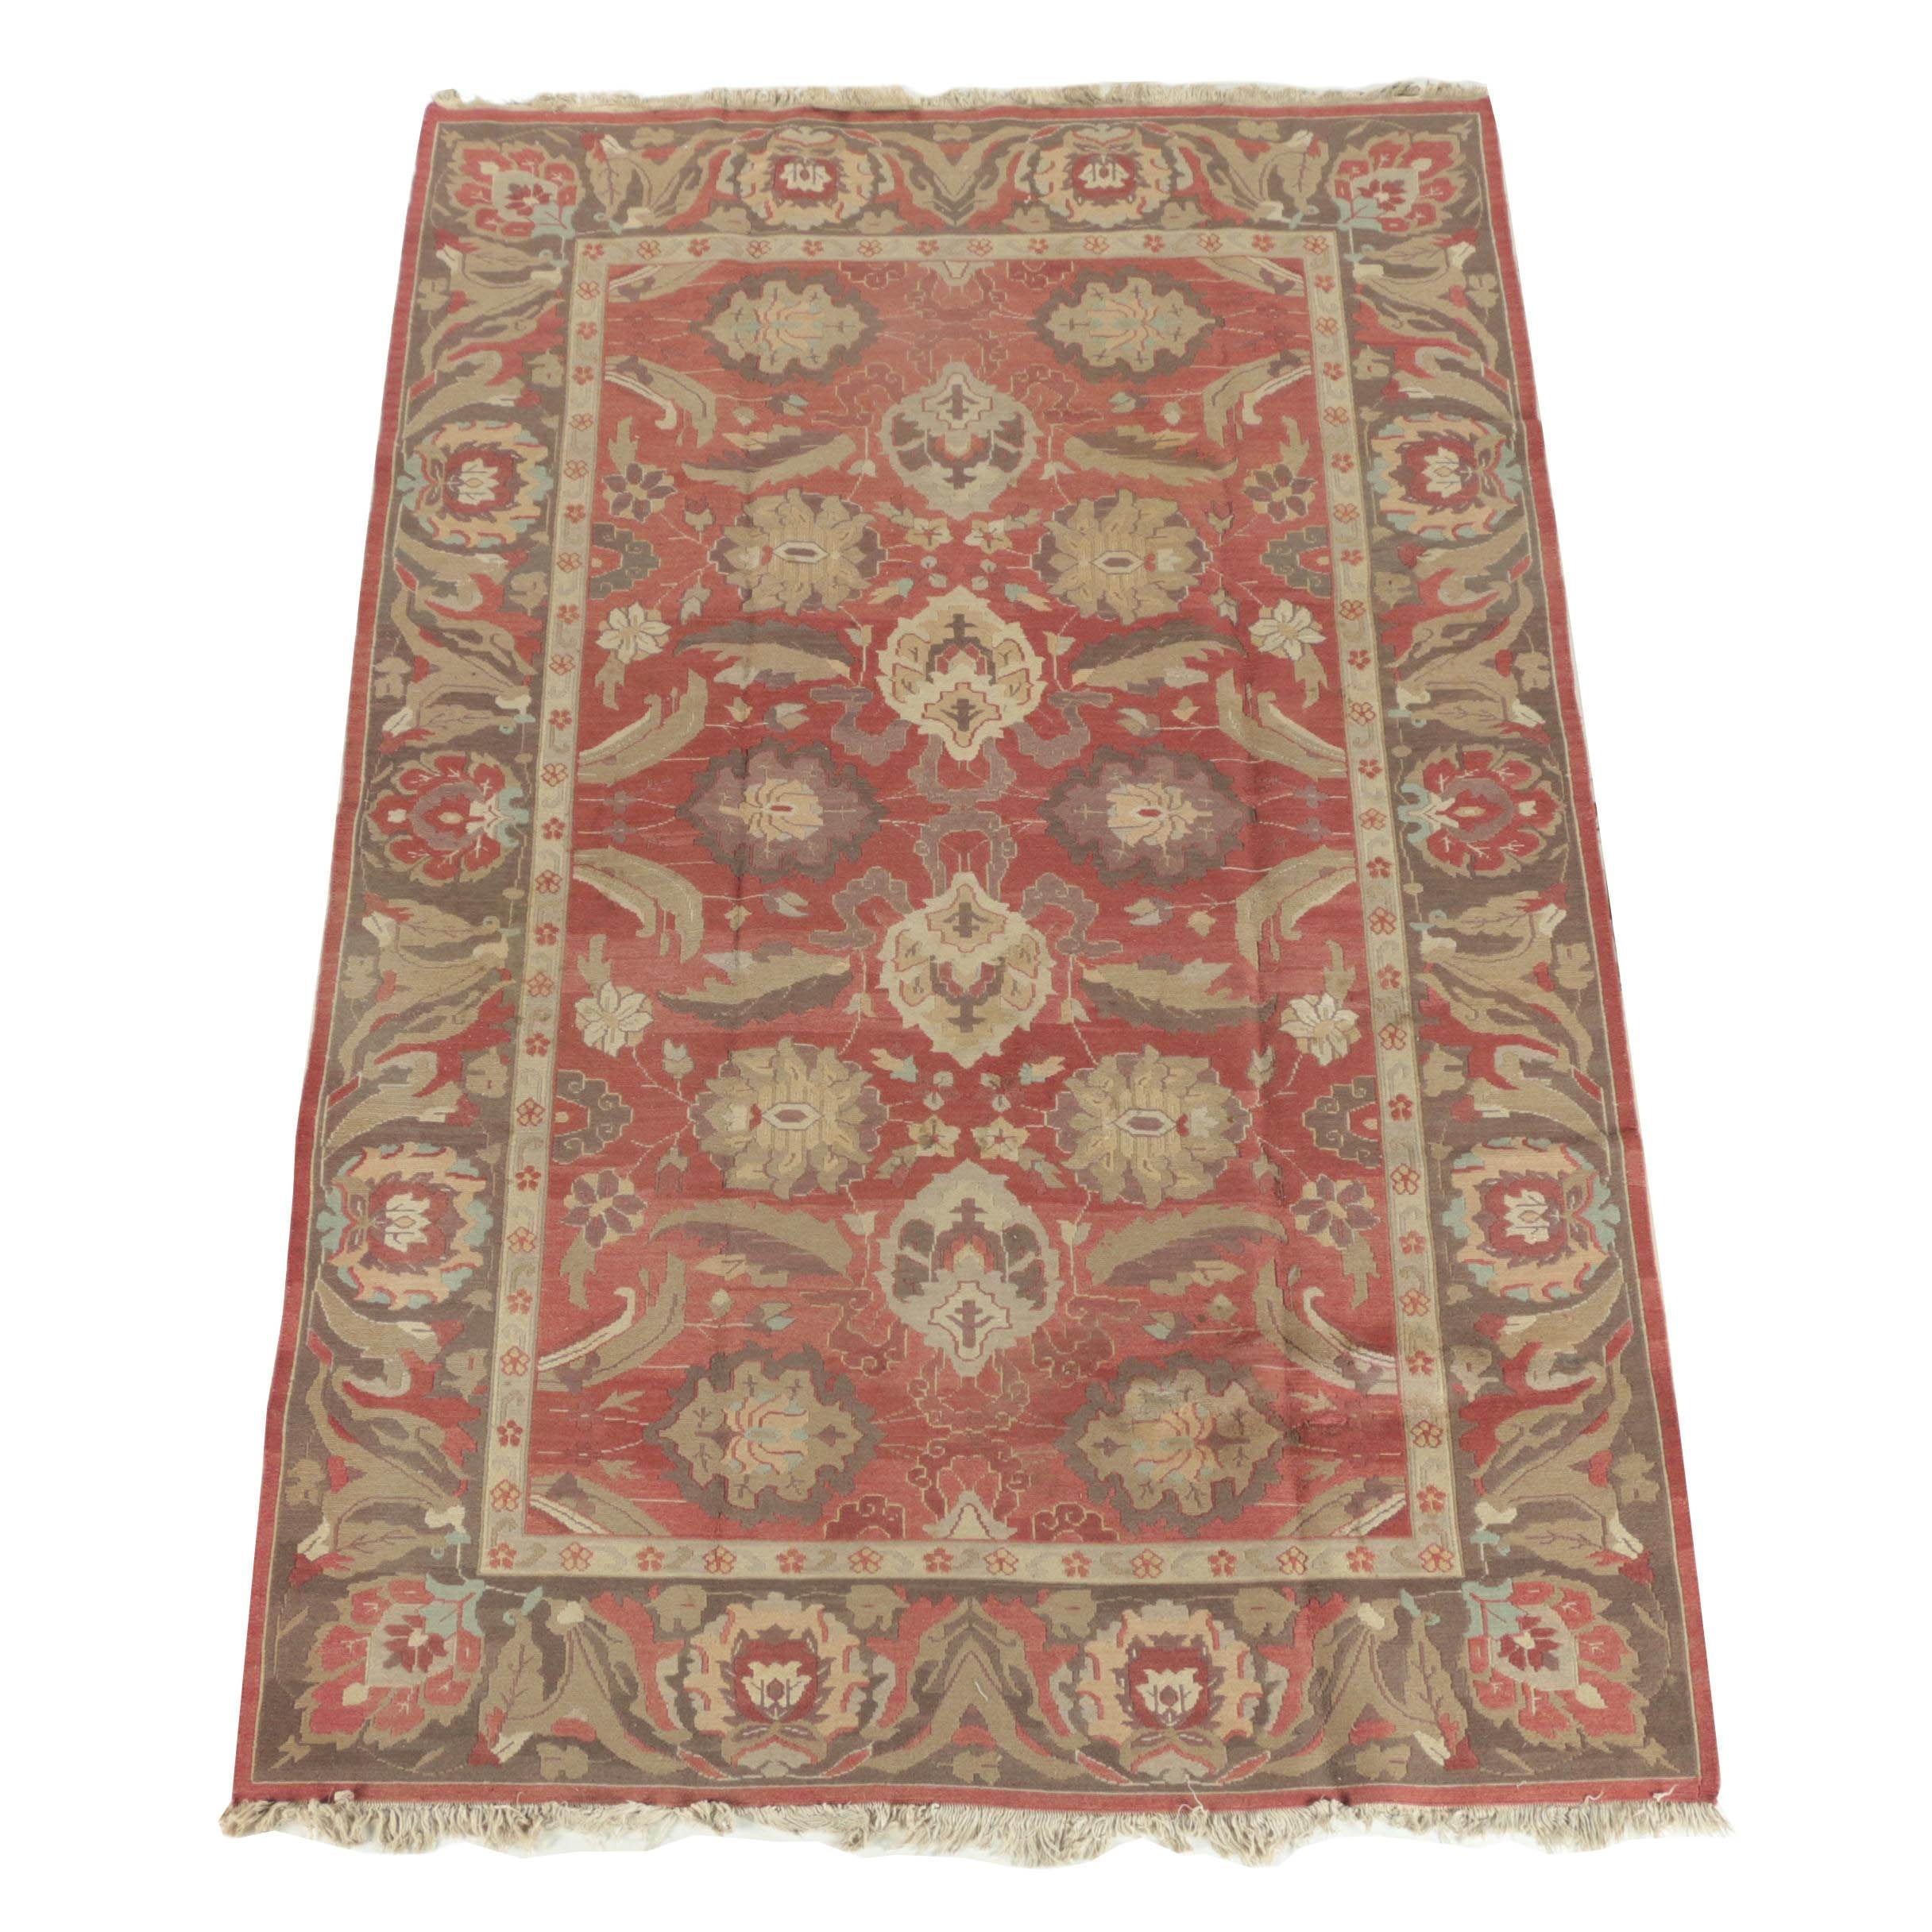 Handwoven Indian Agra-Style Wool Soumak Rug